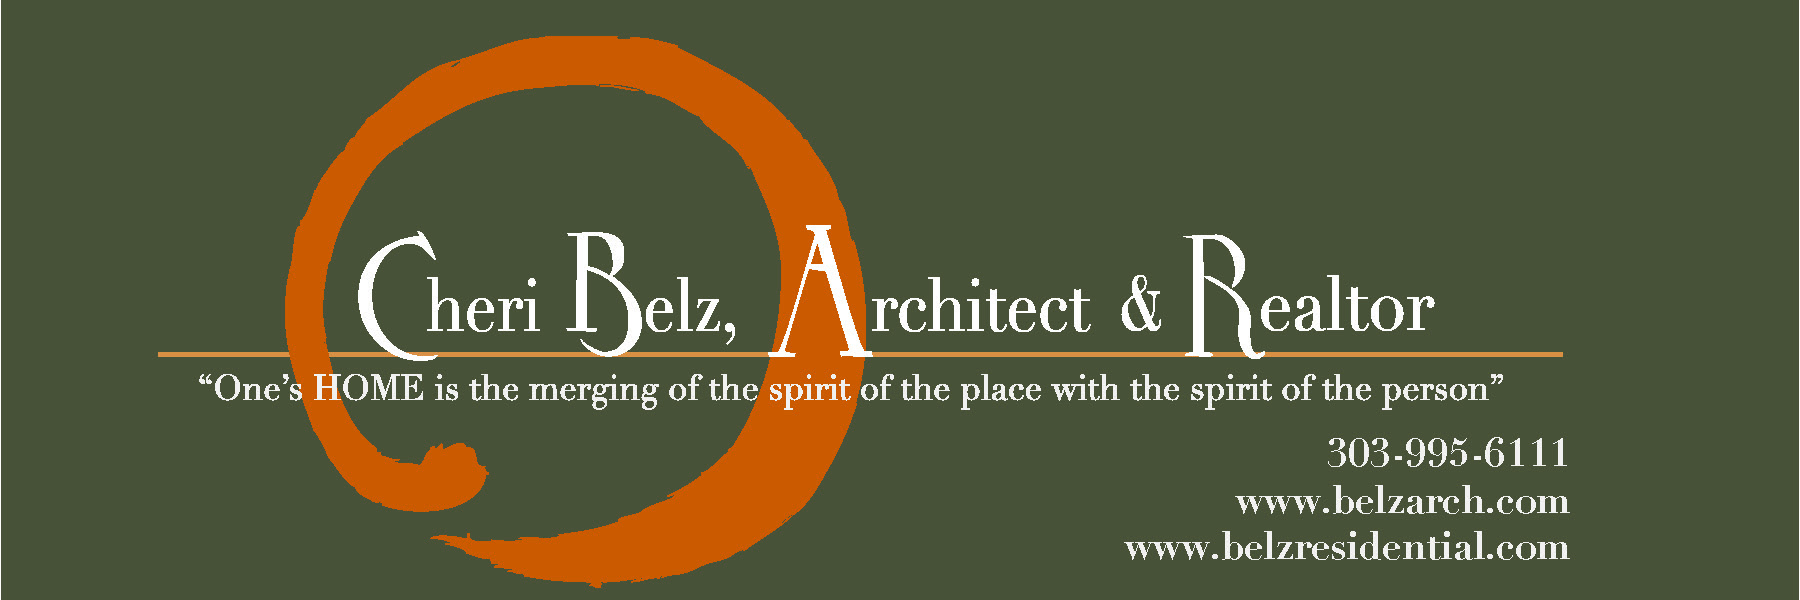 Belz Architect